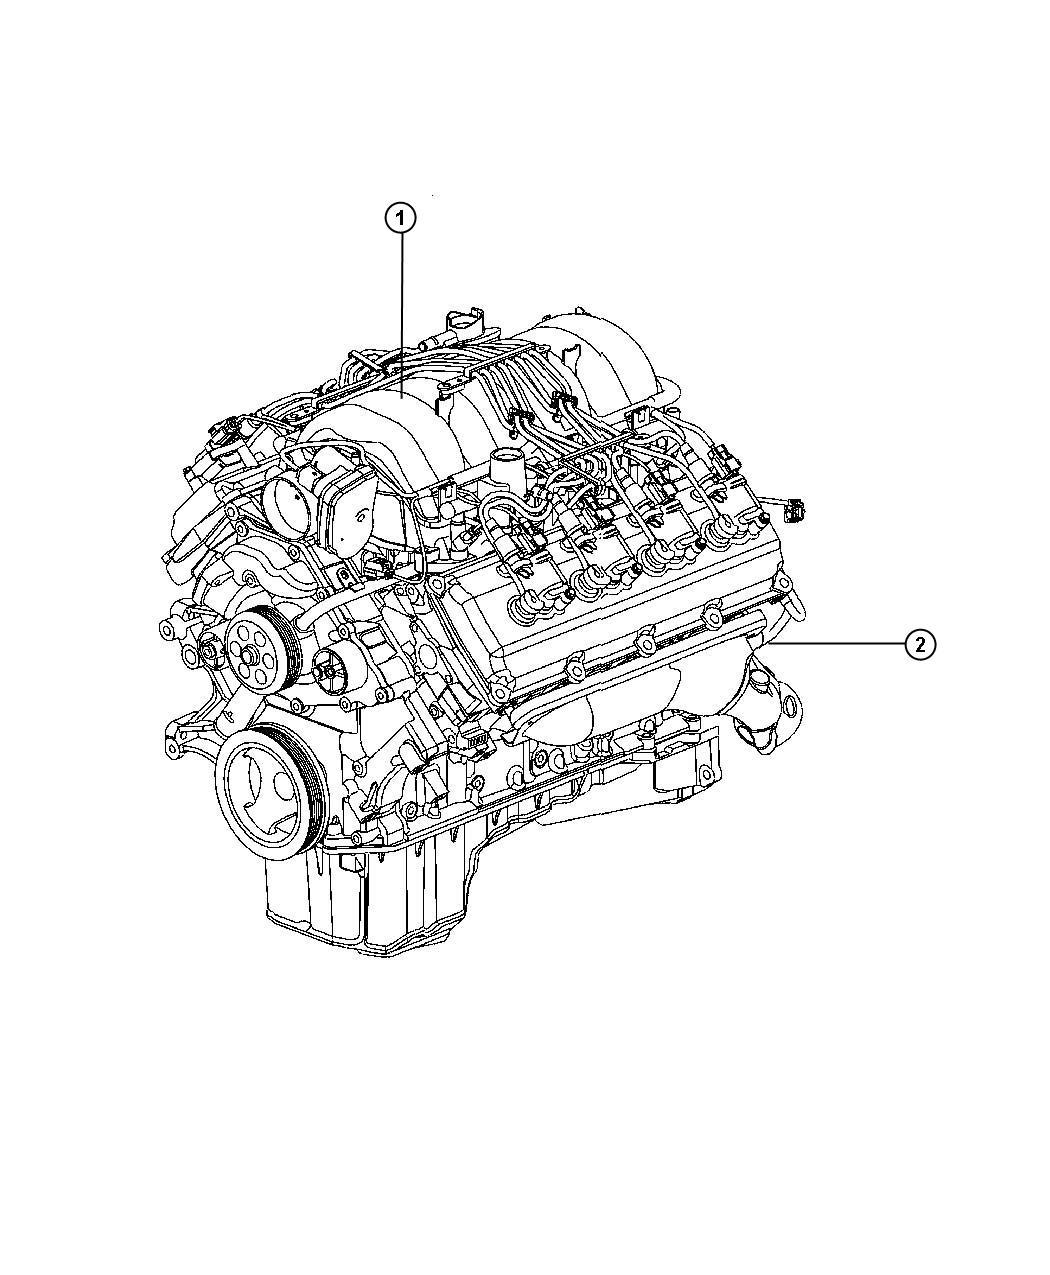 ram 1500 engine  long block  remanufactured  manifold  failure  valve